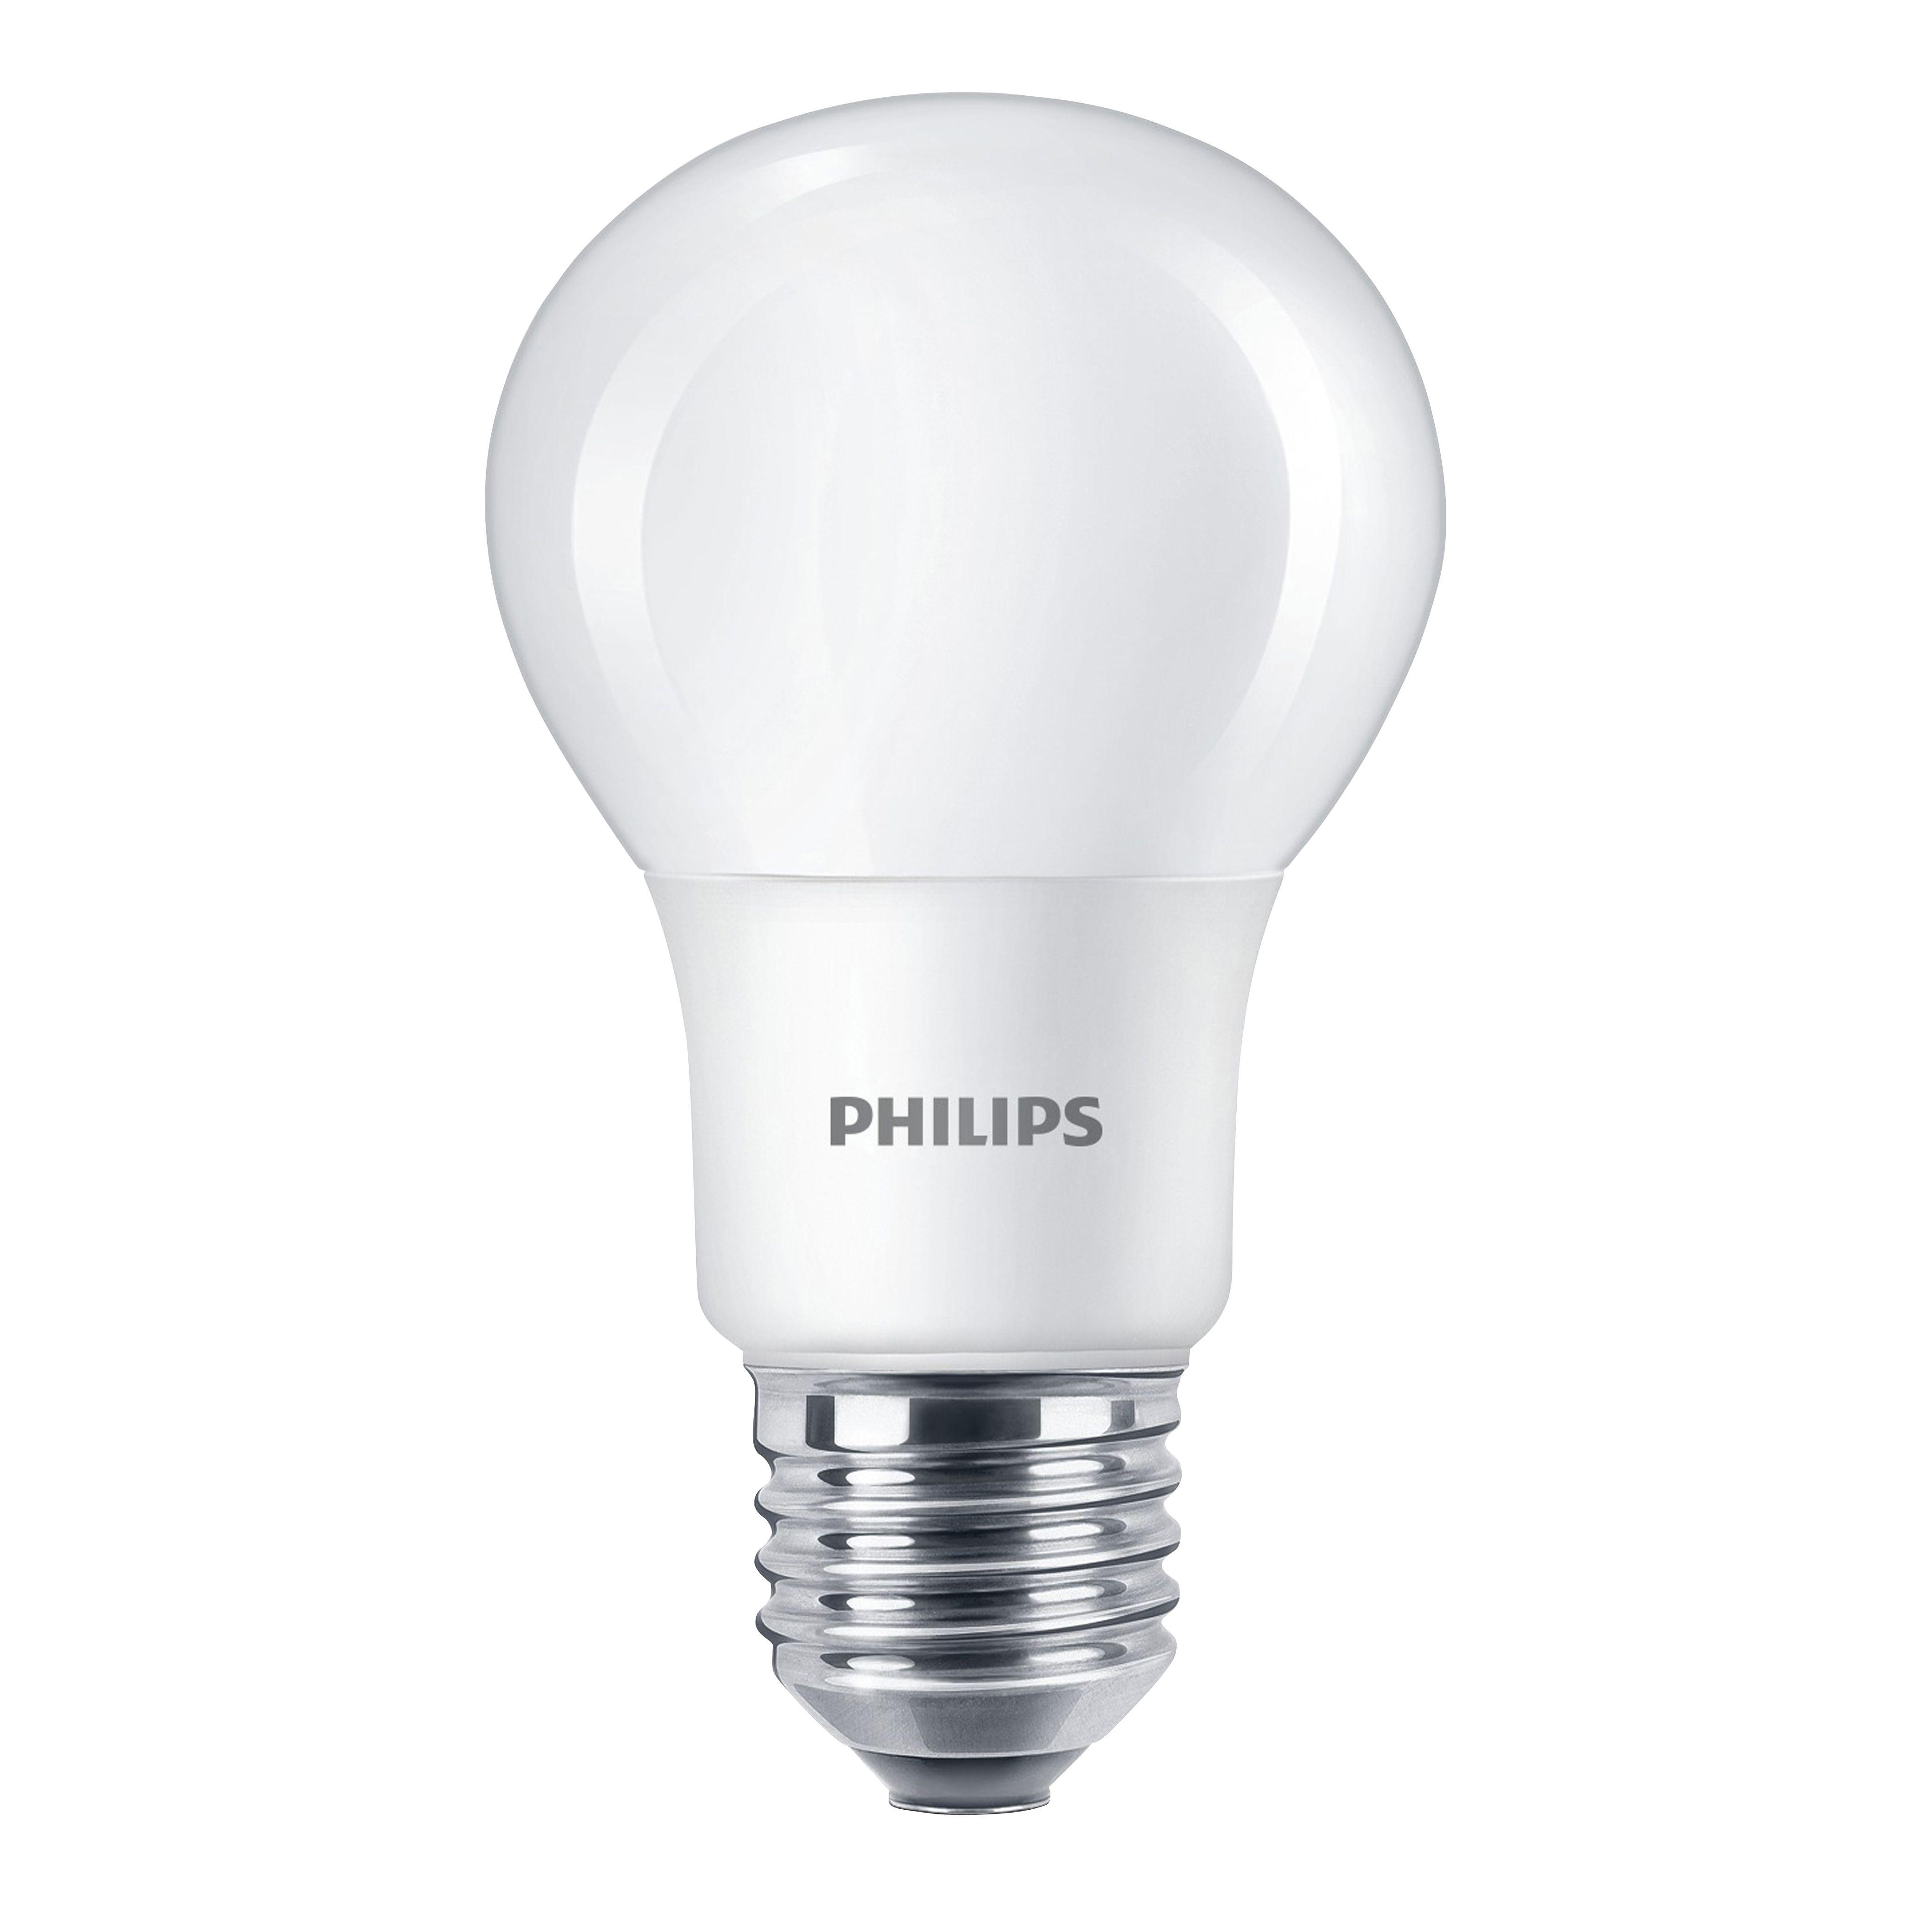 philips hue led smart light bulb starter pack with bridge edison screw cap e27 departments. Black Bedroom Furniture Sets. Home Design Ideas